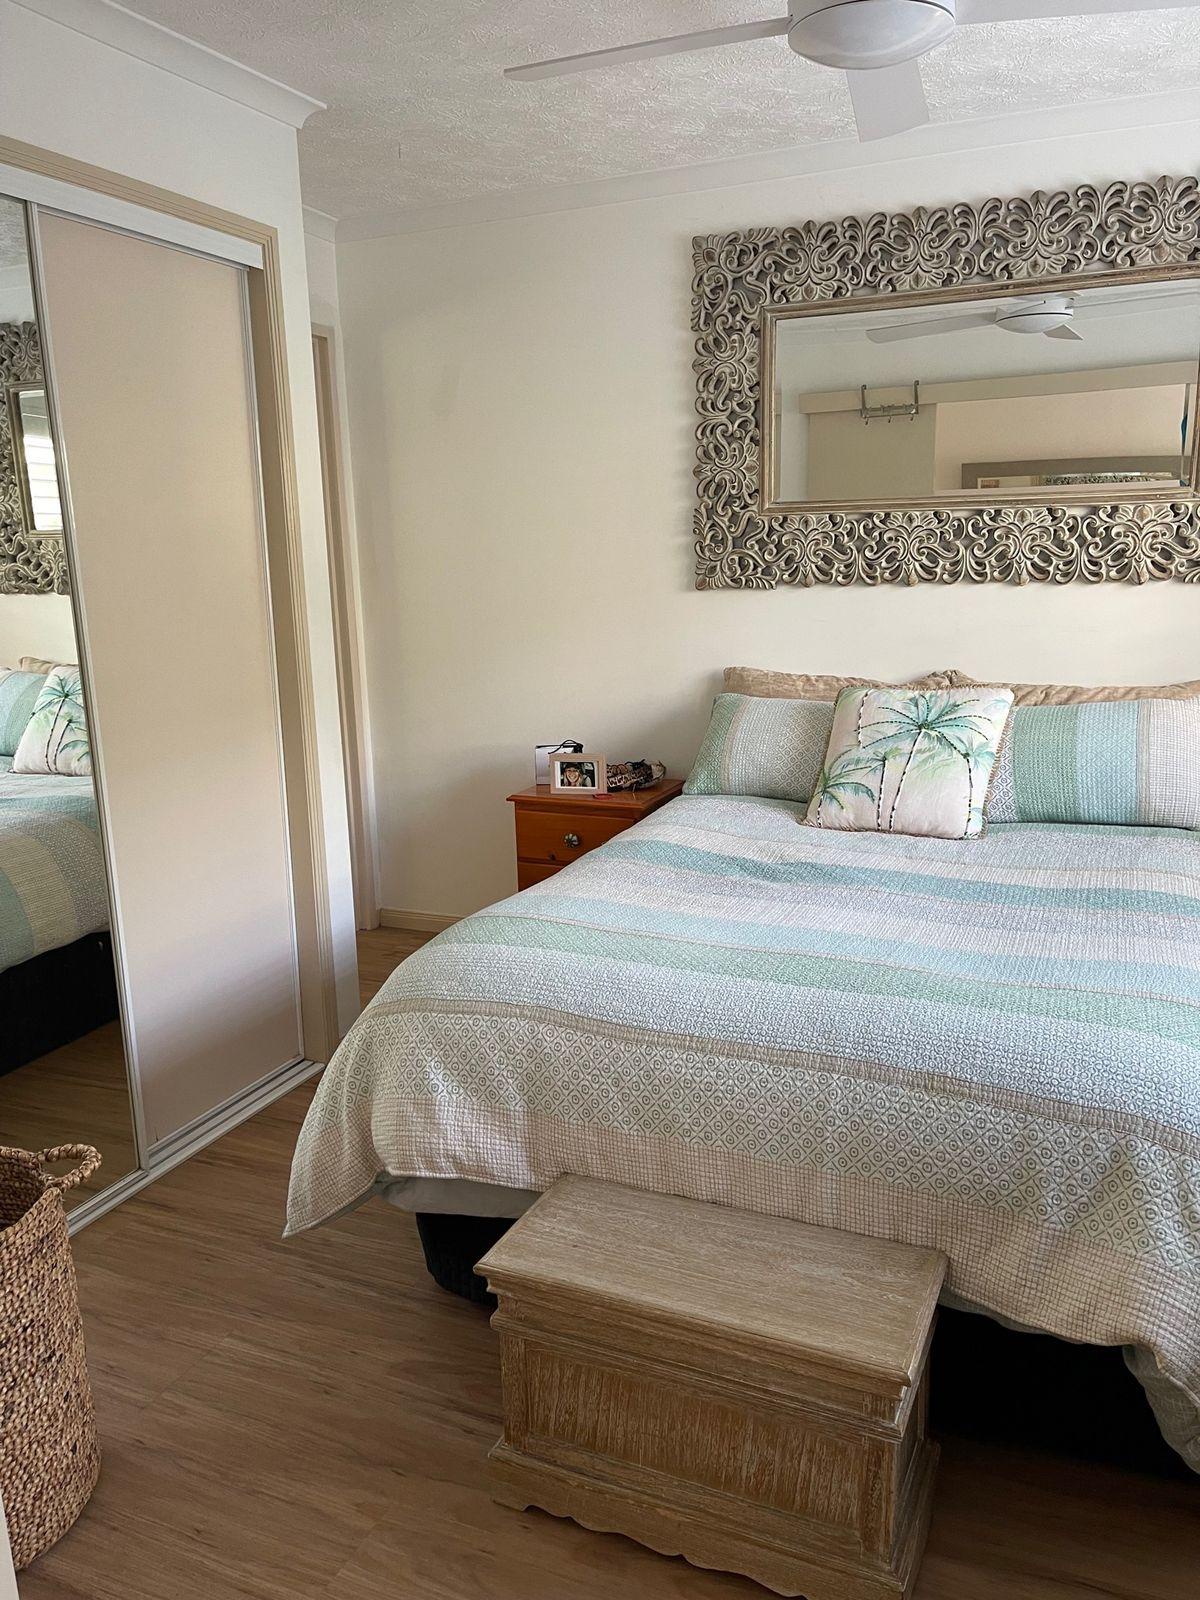 9/4 Adori Street, Chevron Island, QLD 4217